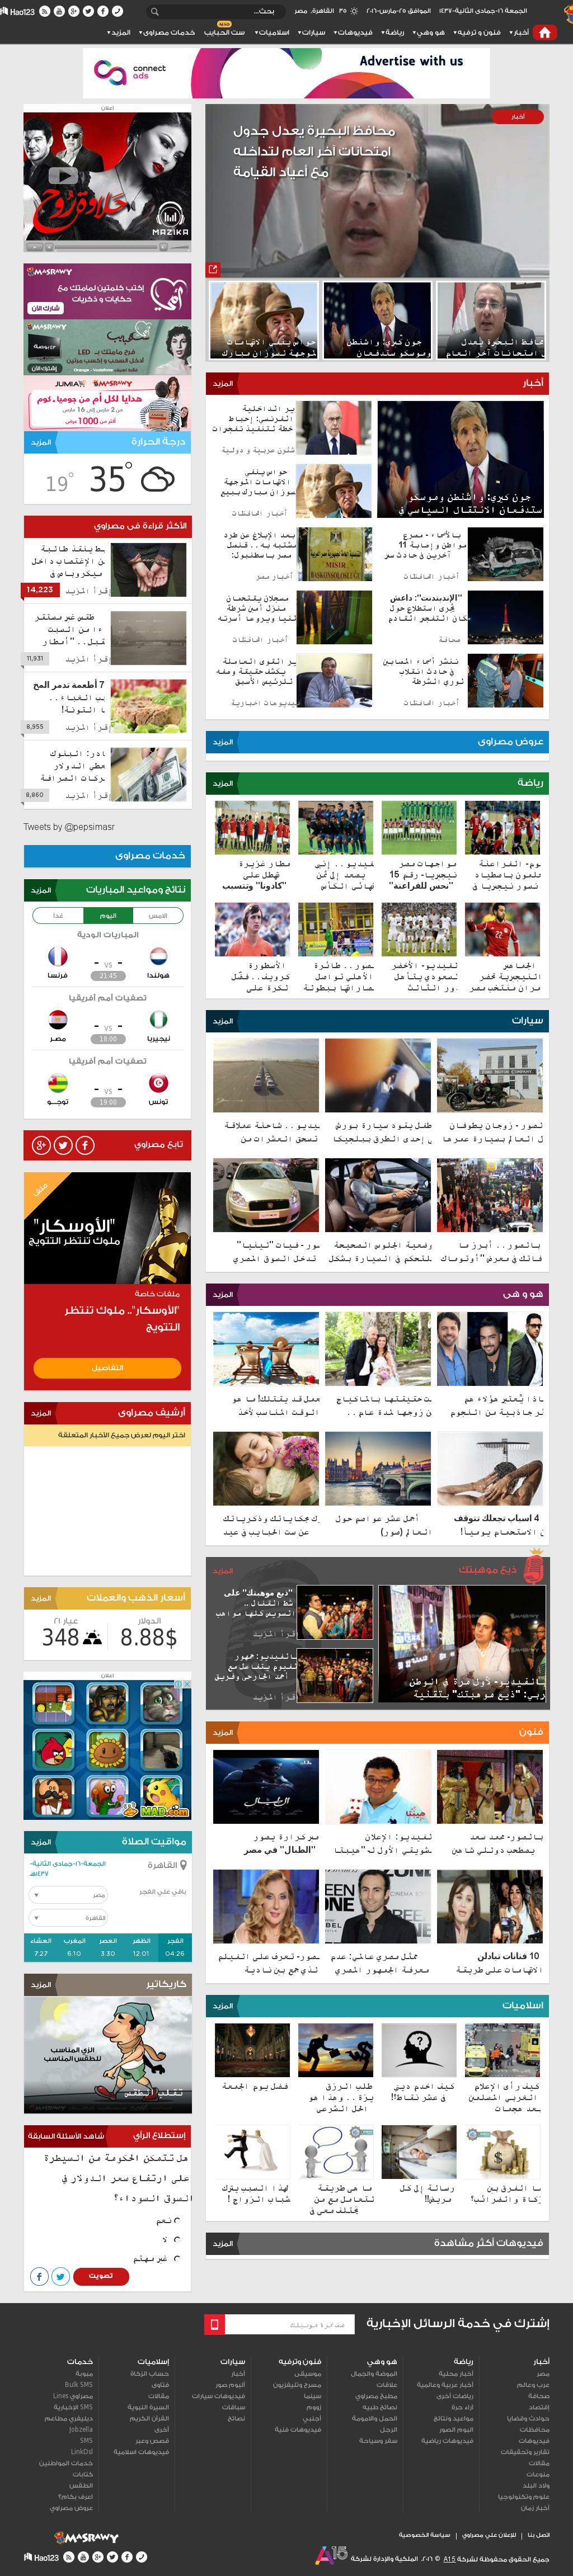 Masrawy at Thursday March 24, 2016, 11:10 p.m. UTC